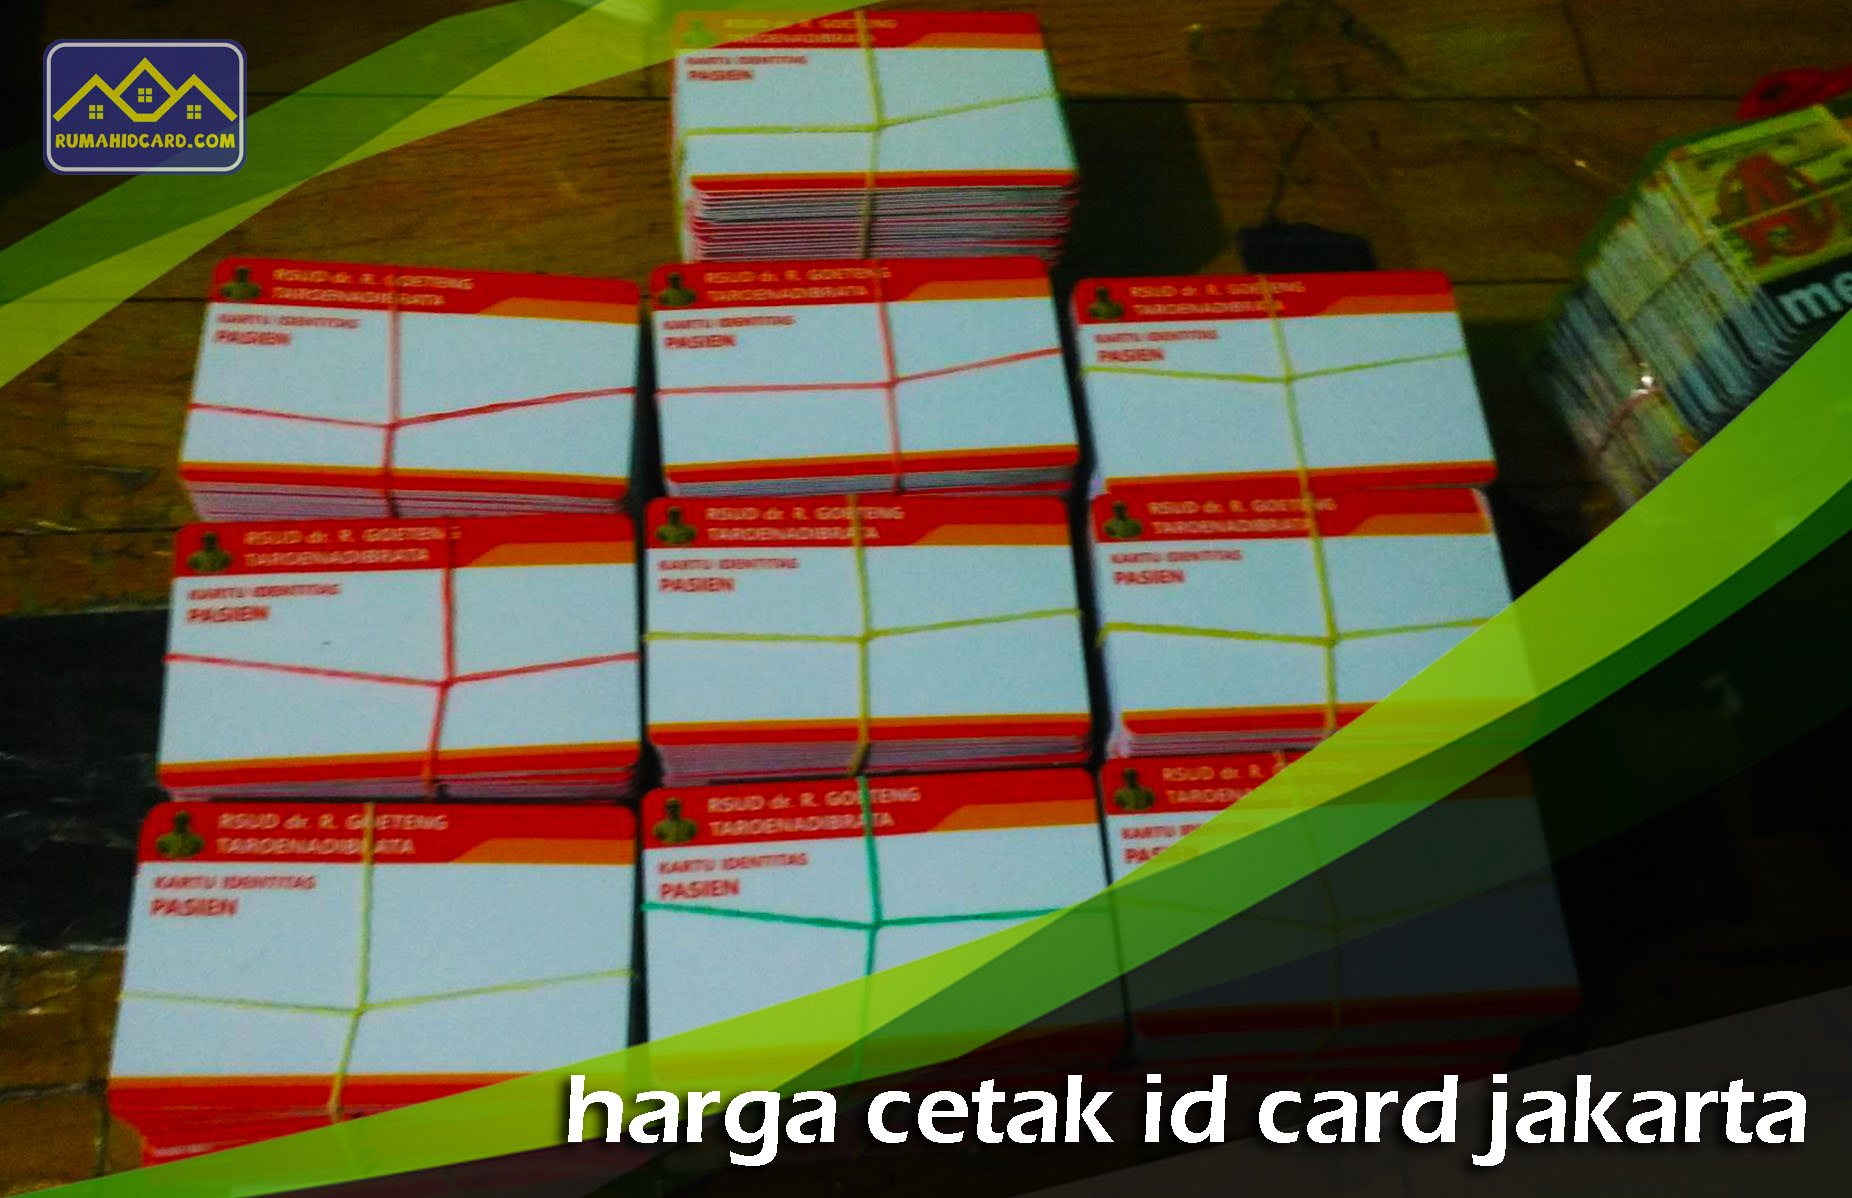 Harga Cetak Id Card Jakarta